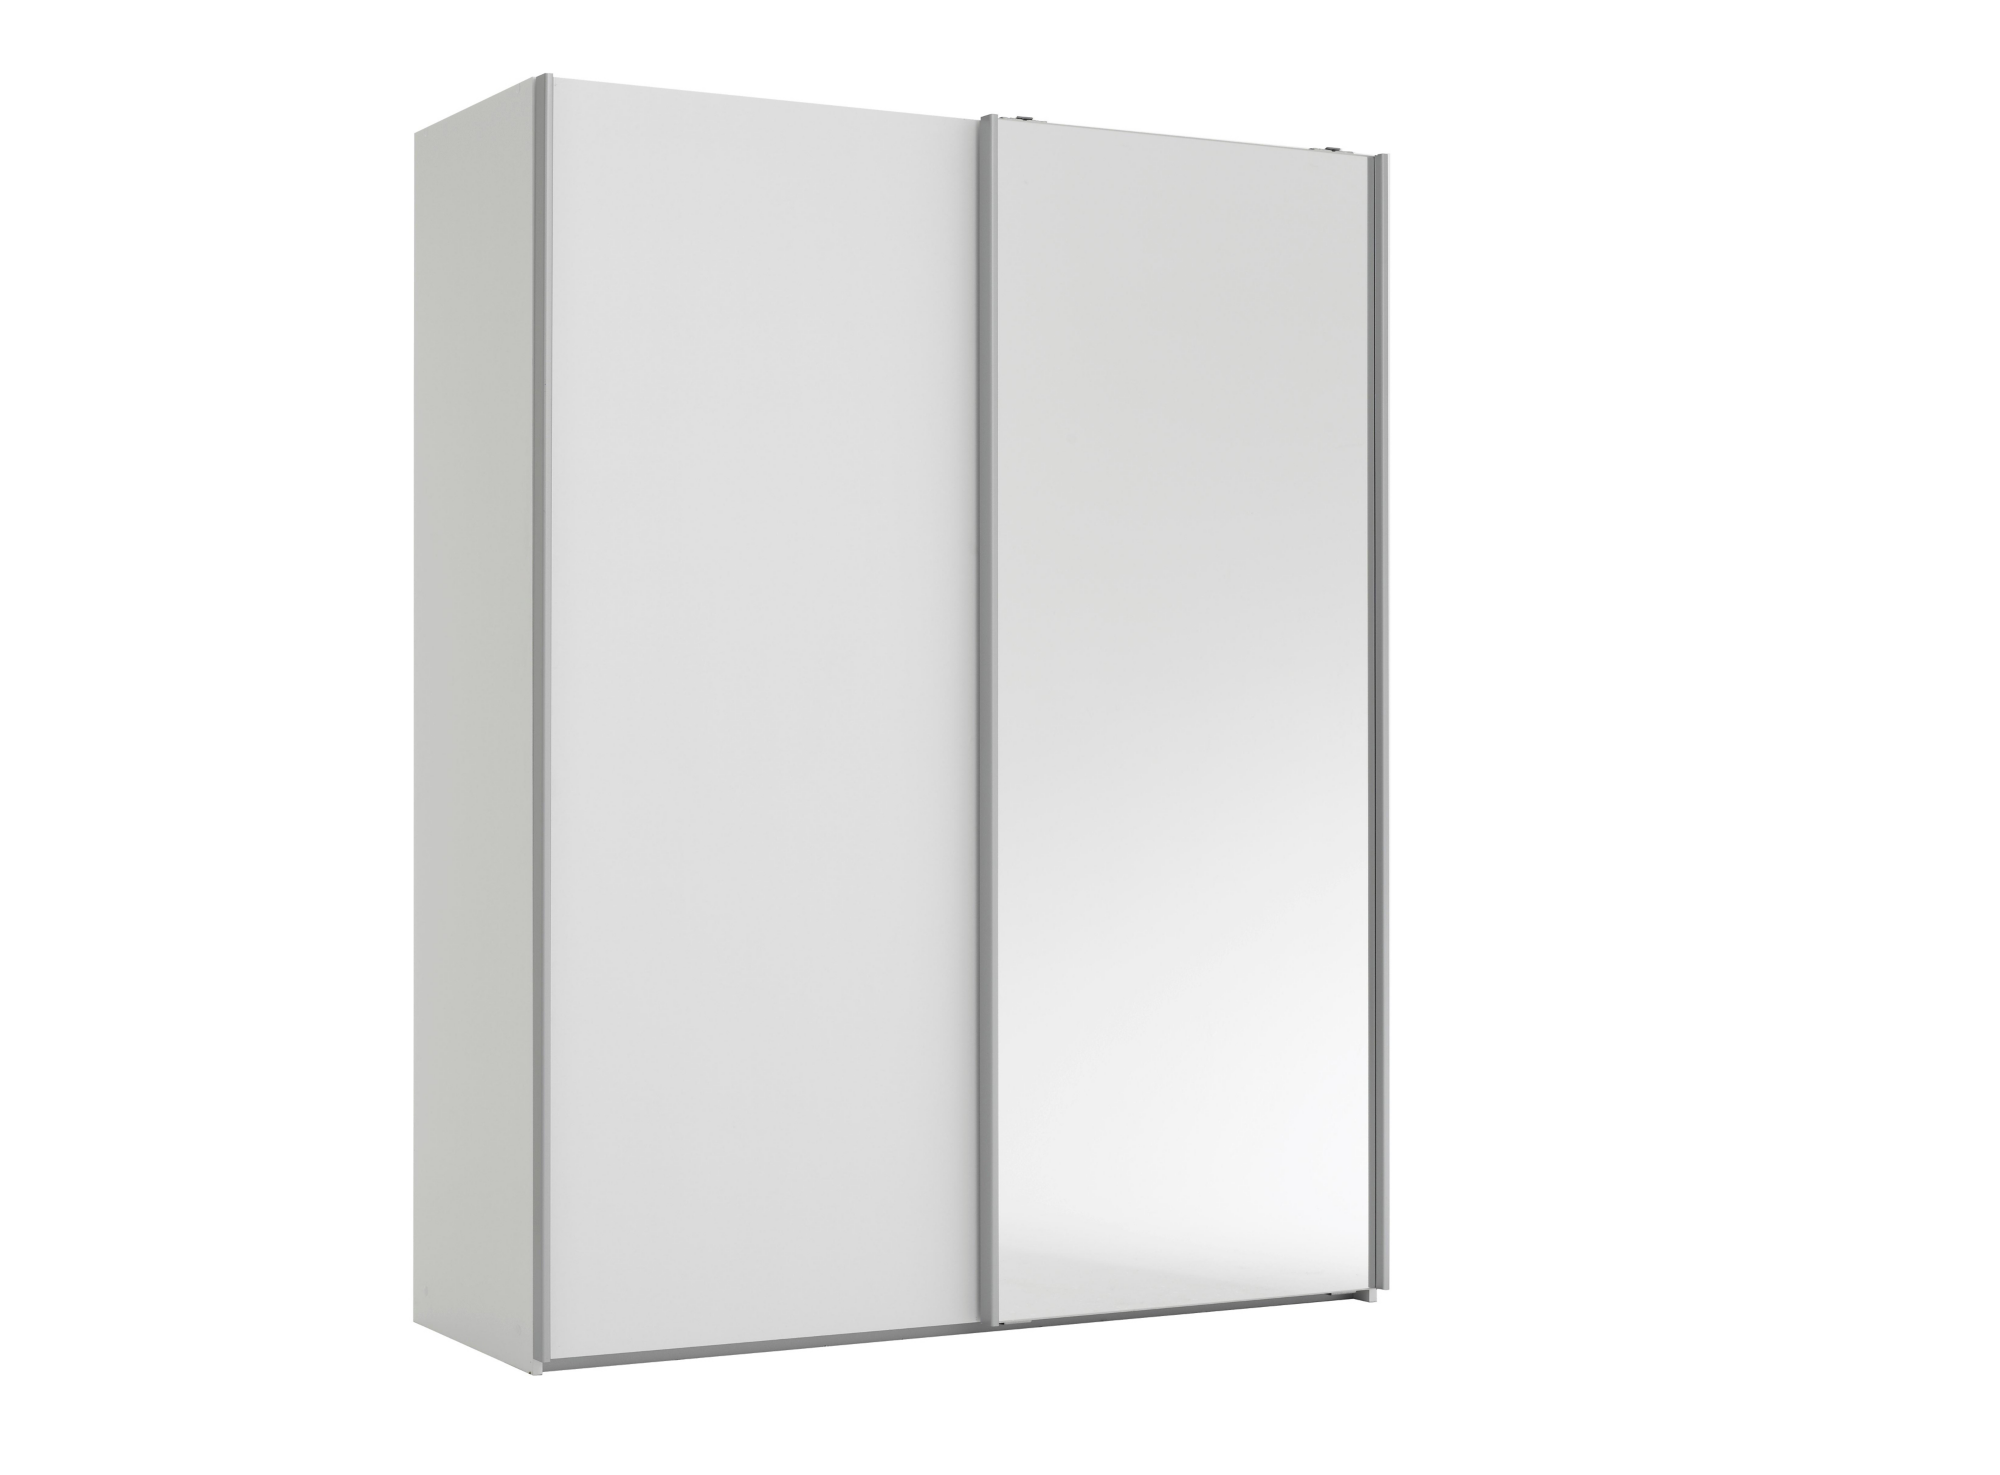 Armoire 2 portes l150 p61 cm blanc miroir armoire for Armoire porte miroir